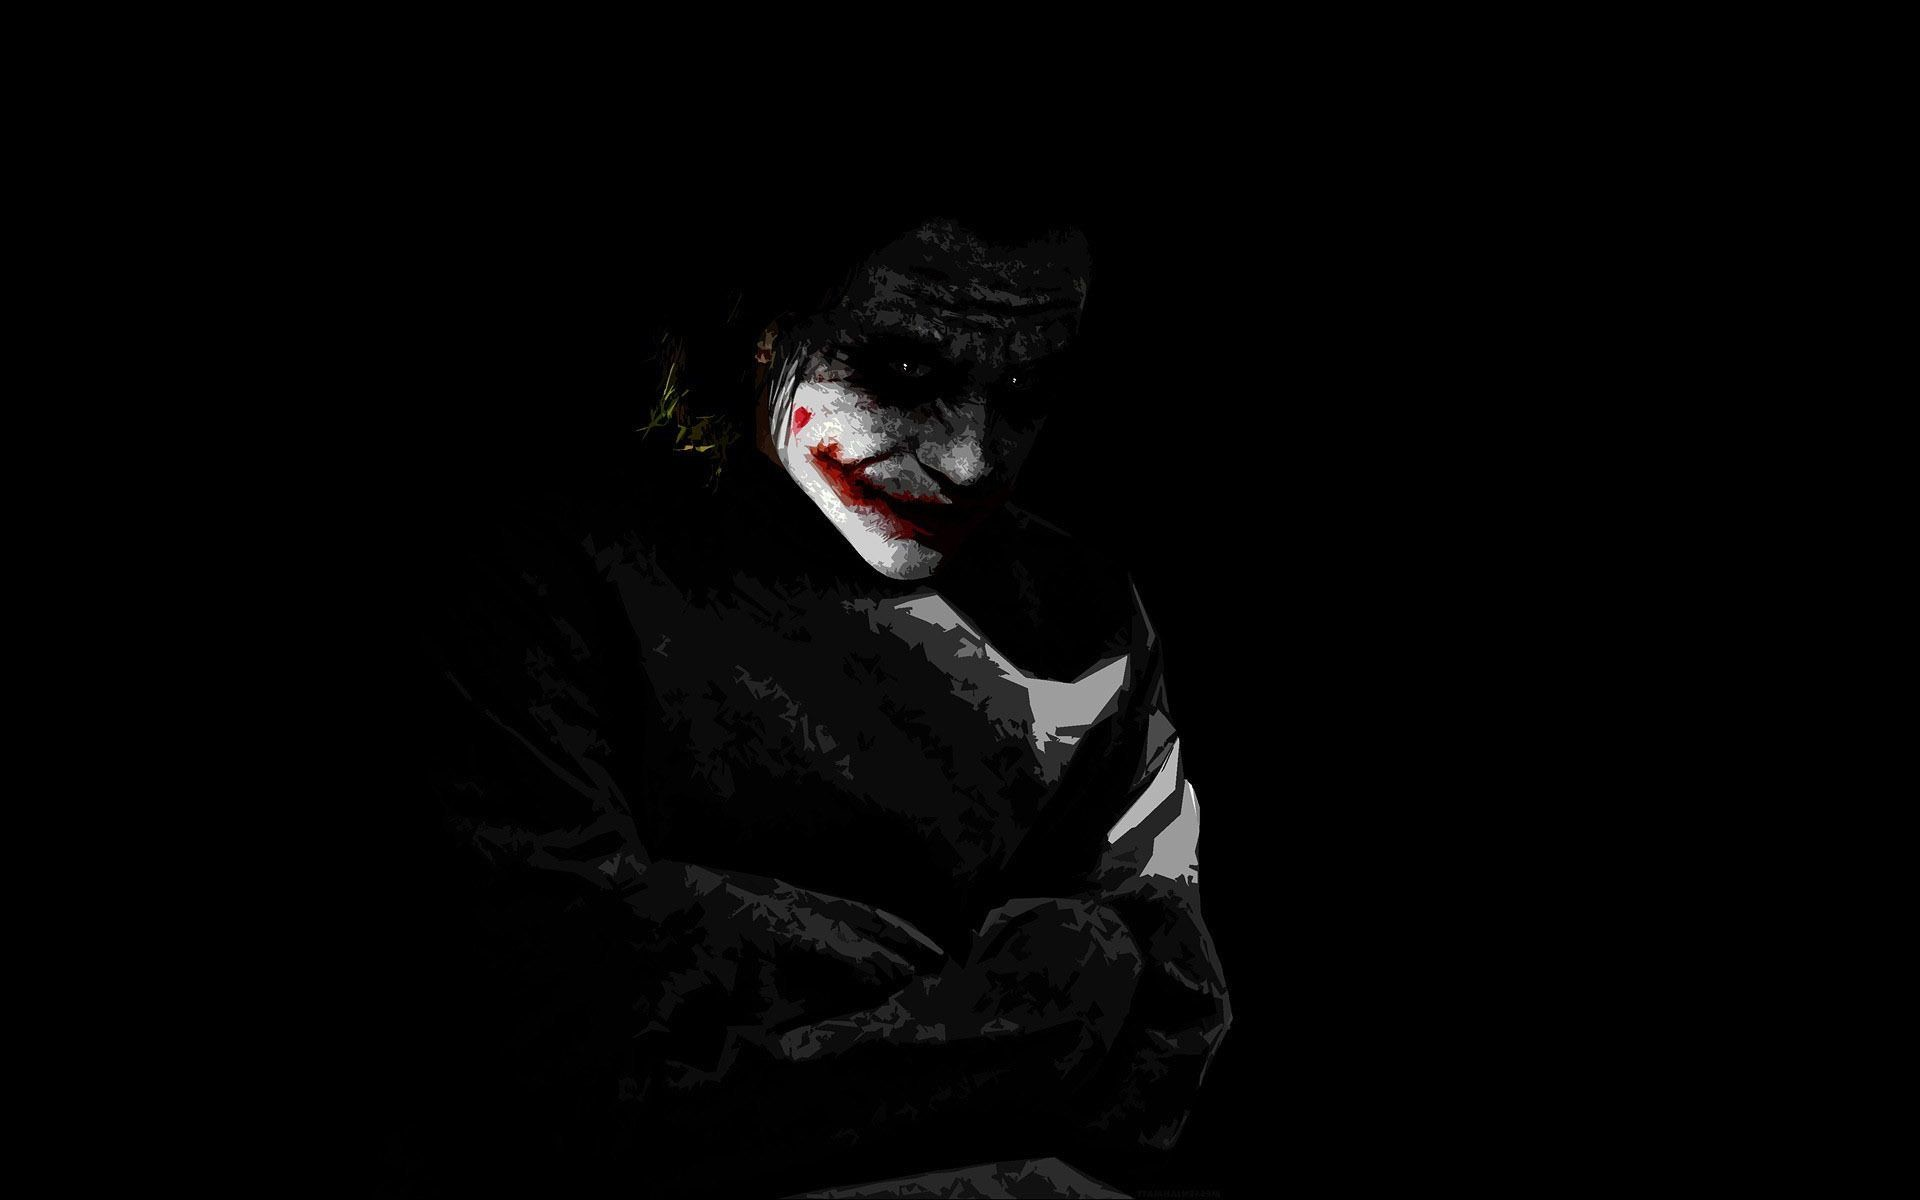 The Joker Heath Ledger Wallpapers Group Heath Ledger Joker Wallpapers HD  Wallpapers)